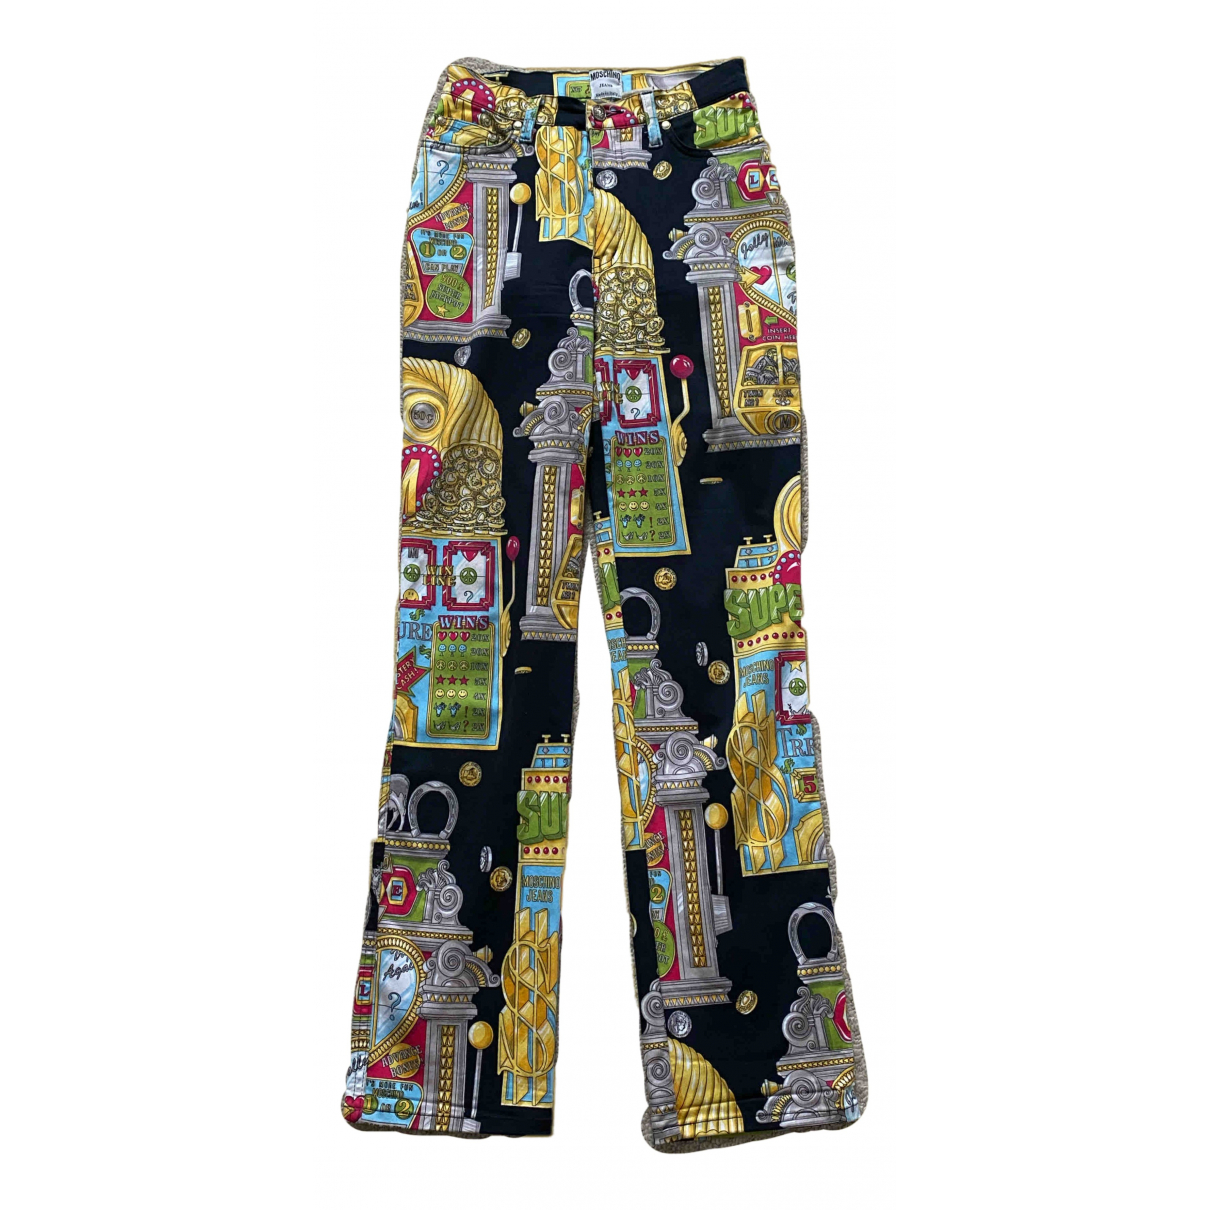 Moschino Cheap And Chic - Pantalon   pour femme en coton - multicolore